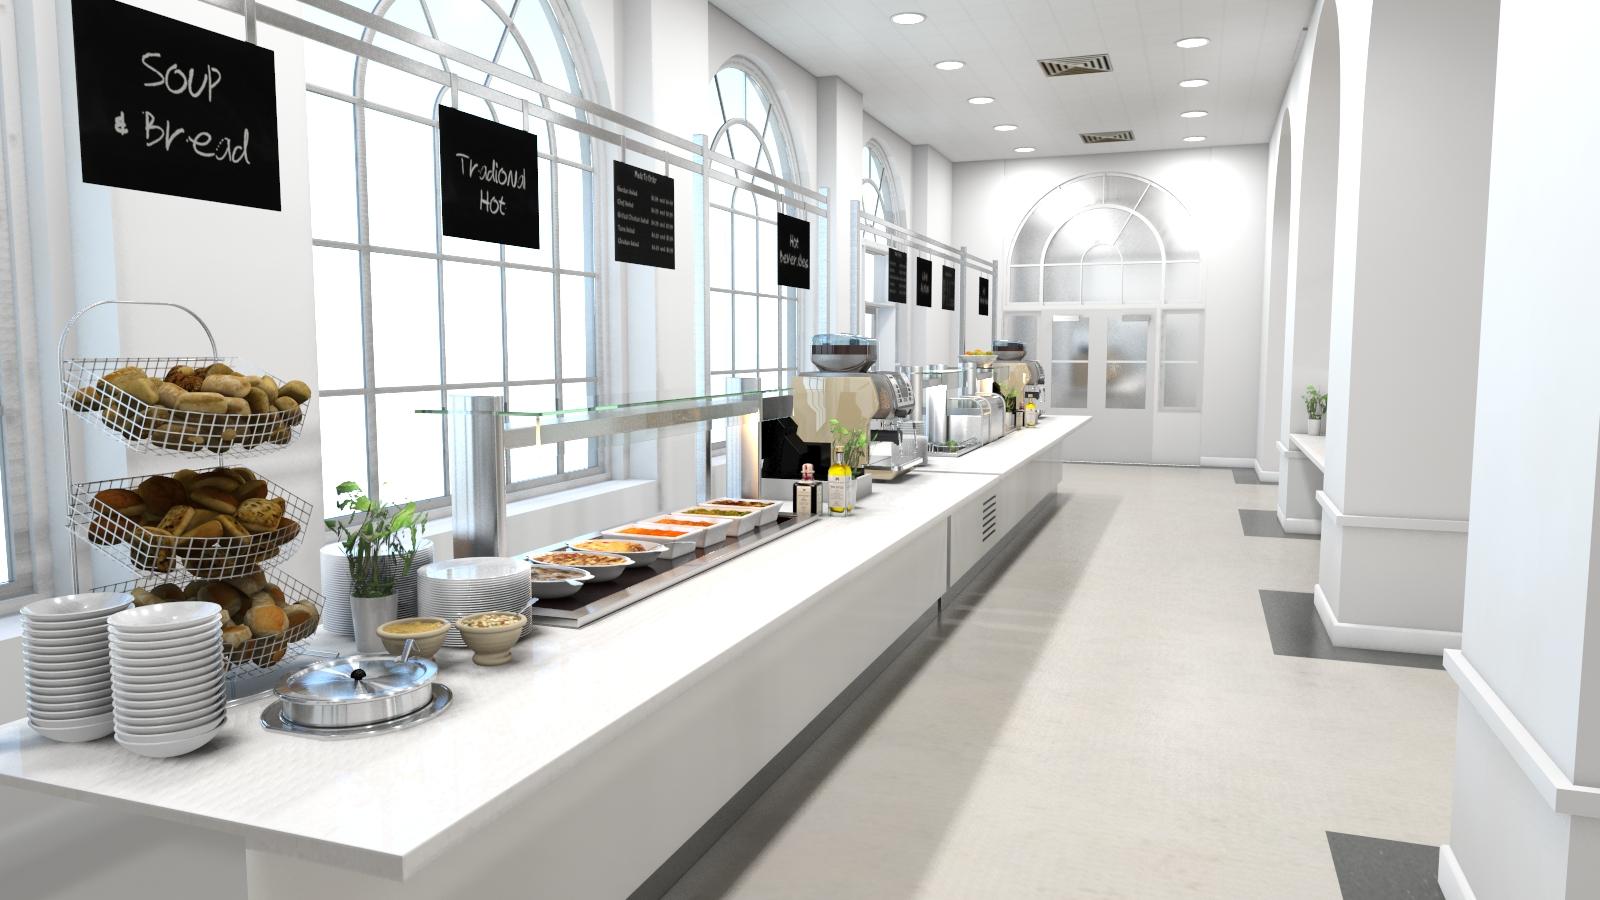 Studio Vonne   Interior Designer in Somerset- Interior Design for Home and Hospitality